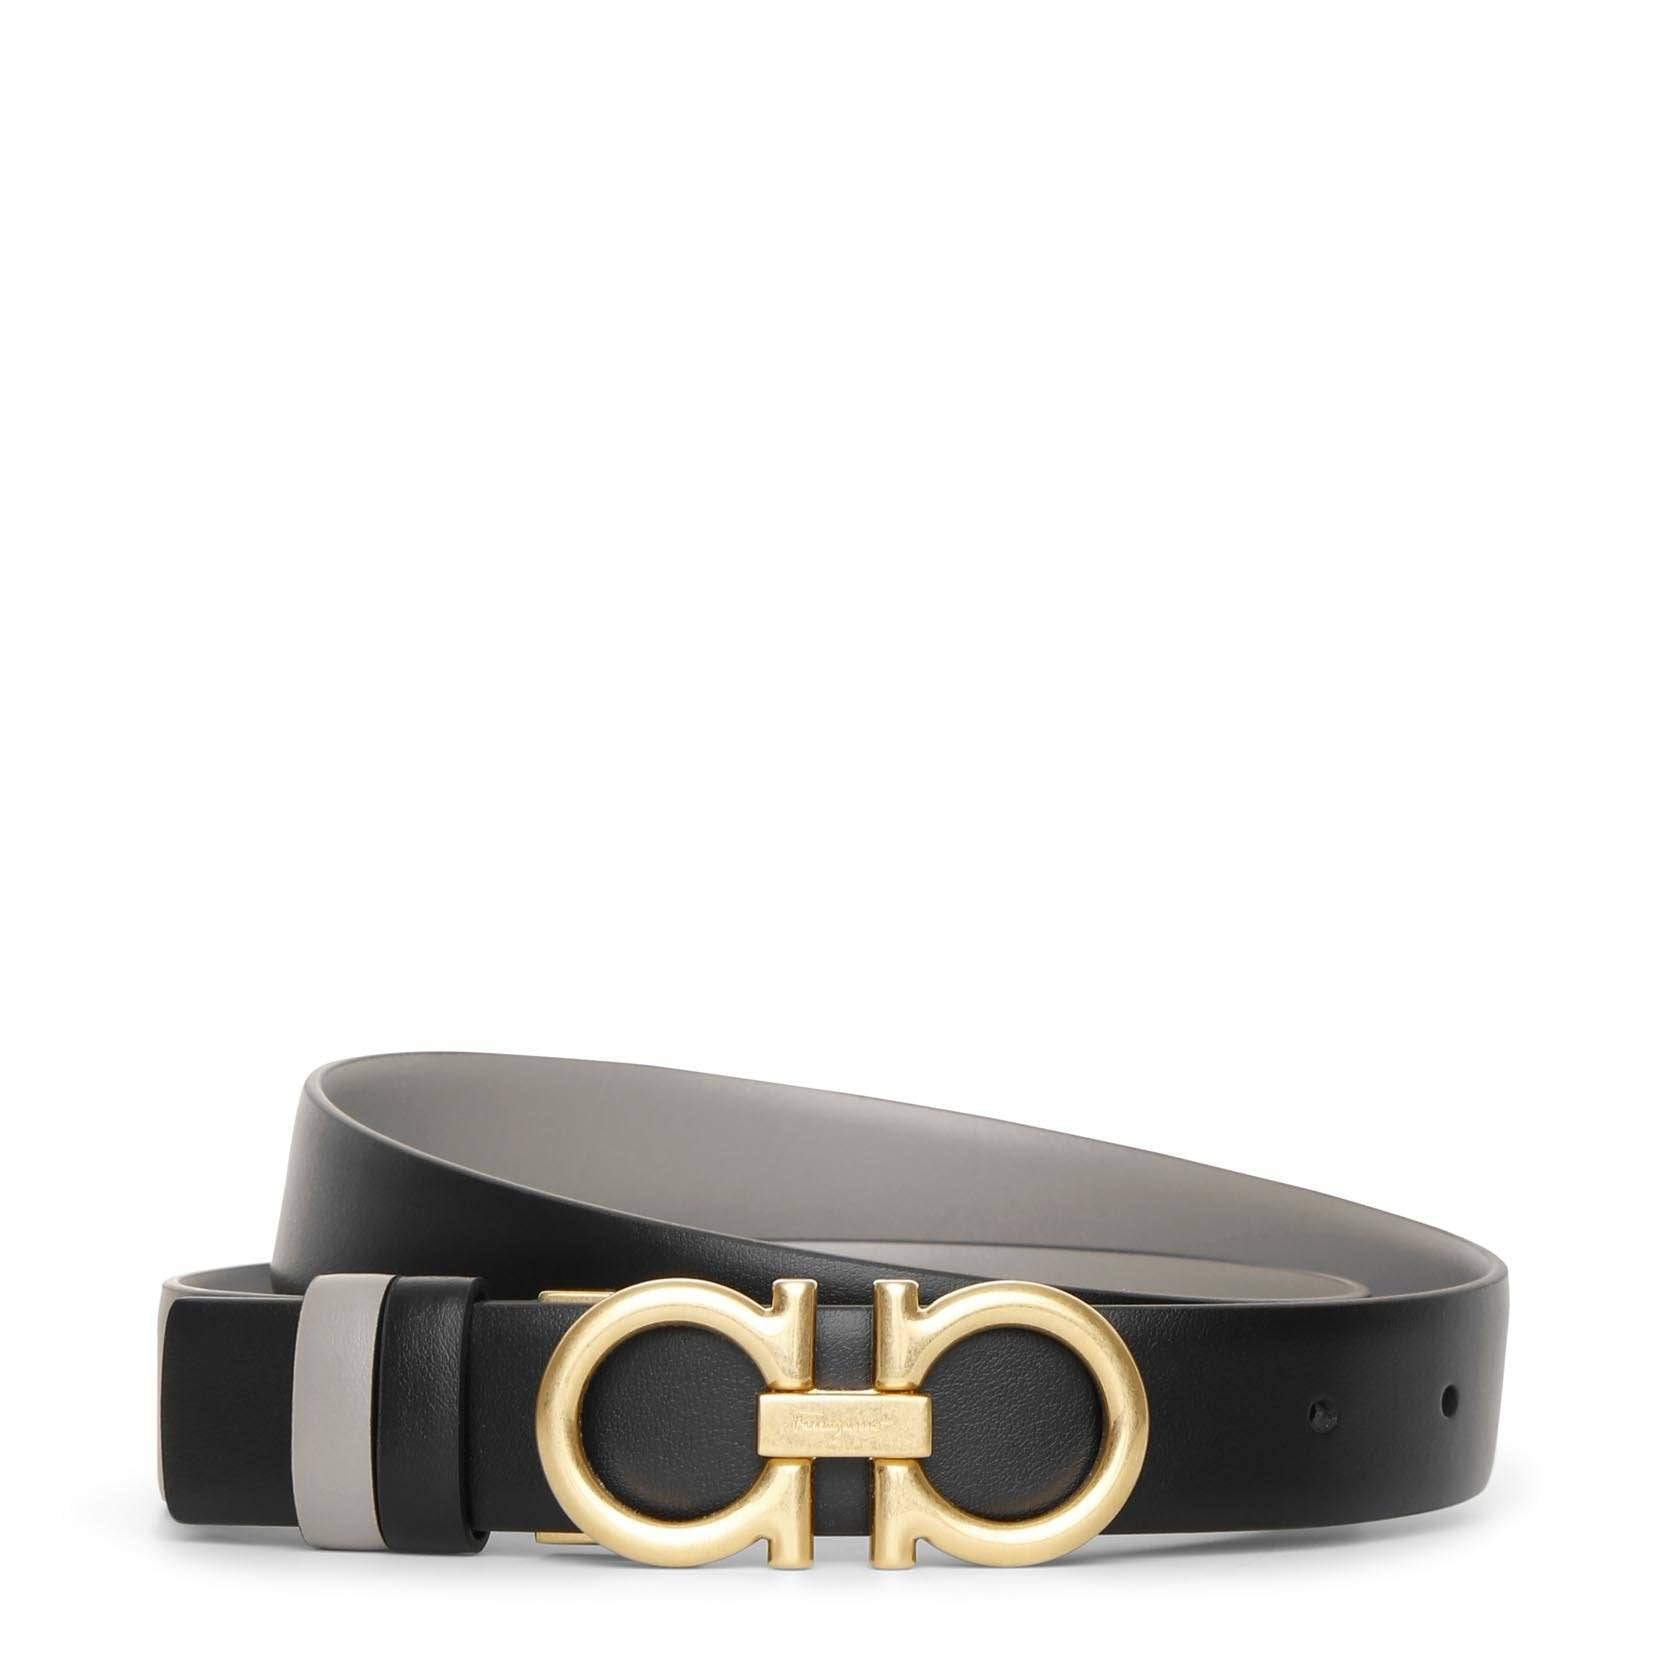 Salvatore Ferragamo Reversable and adjustable grey black leather belt  - black/grey - female - Size: 95